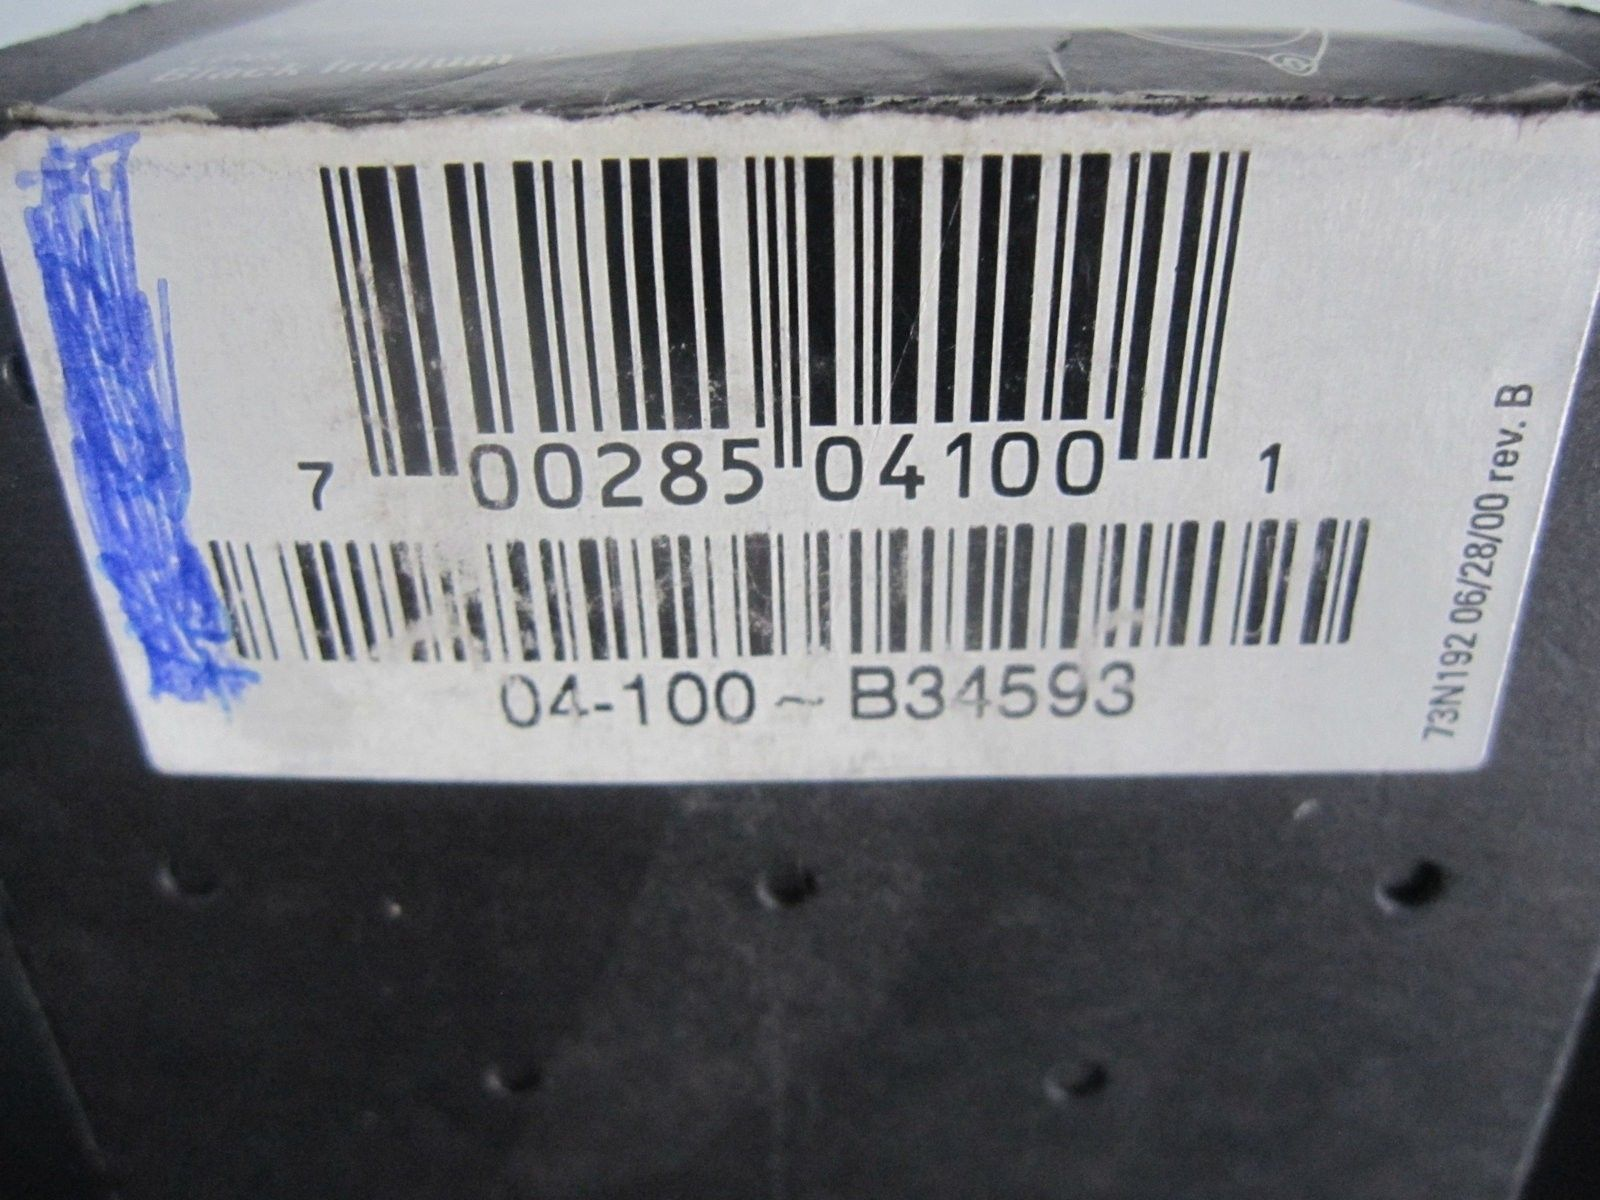 Box for Romeo 1 XM/Black Iridium - $85 - IMG_5615.JPG